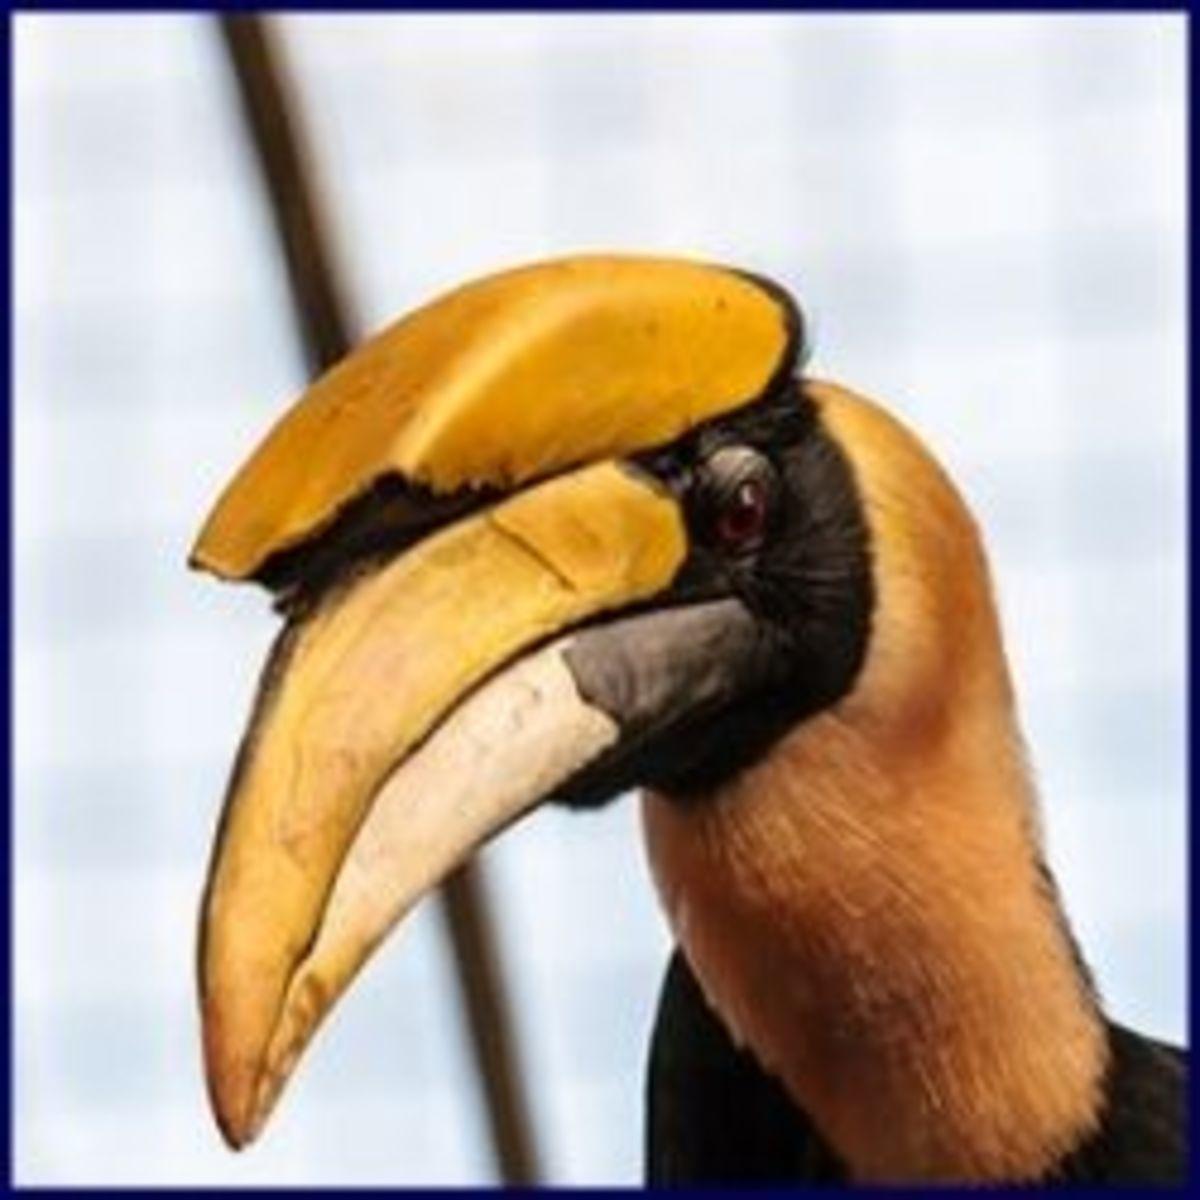 The Great Hornbill Bird